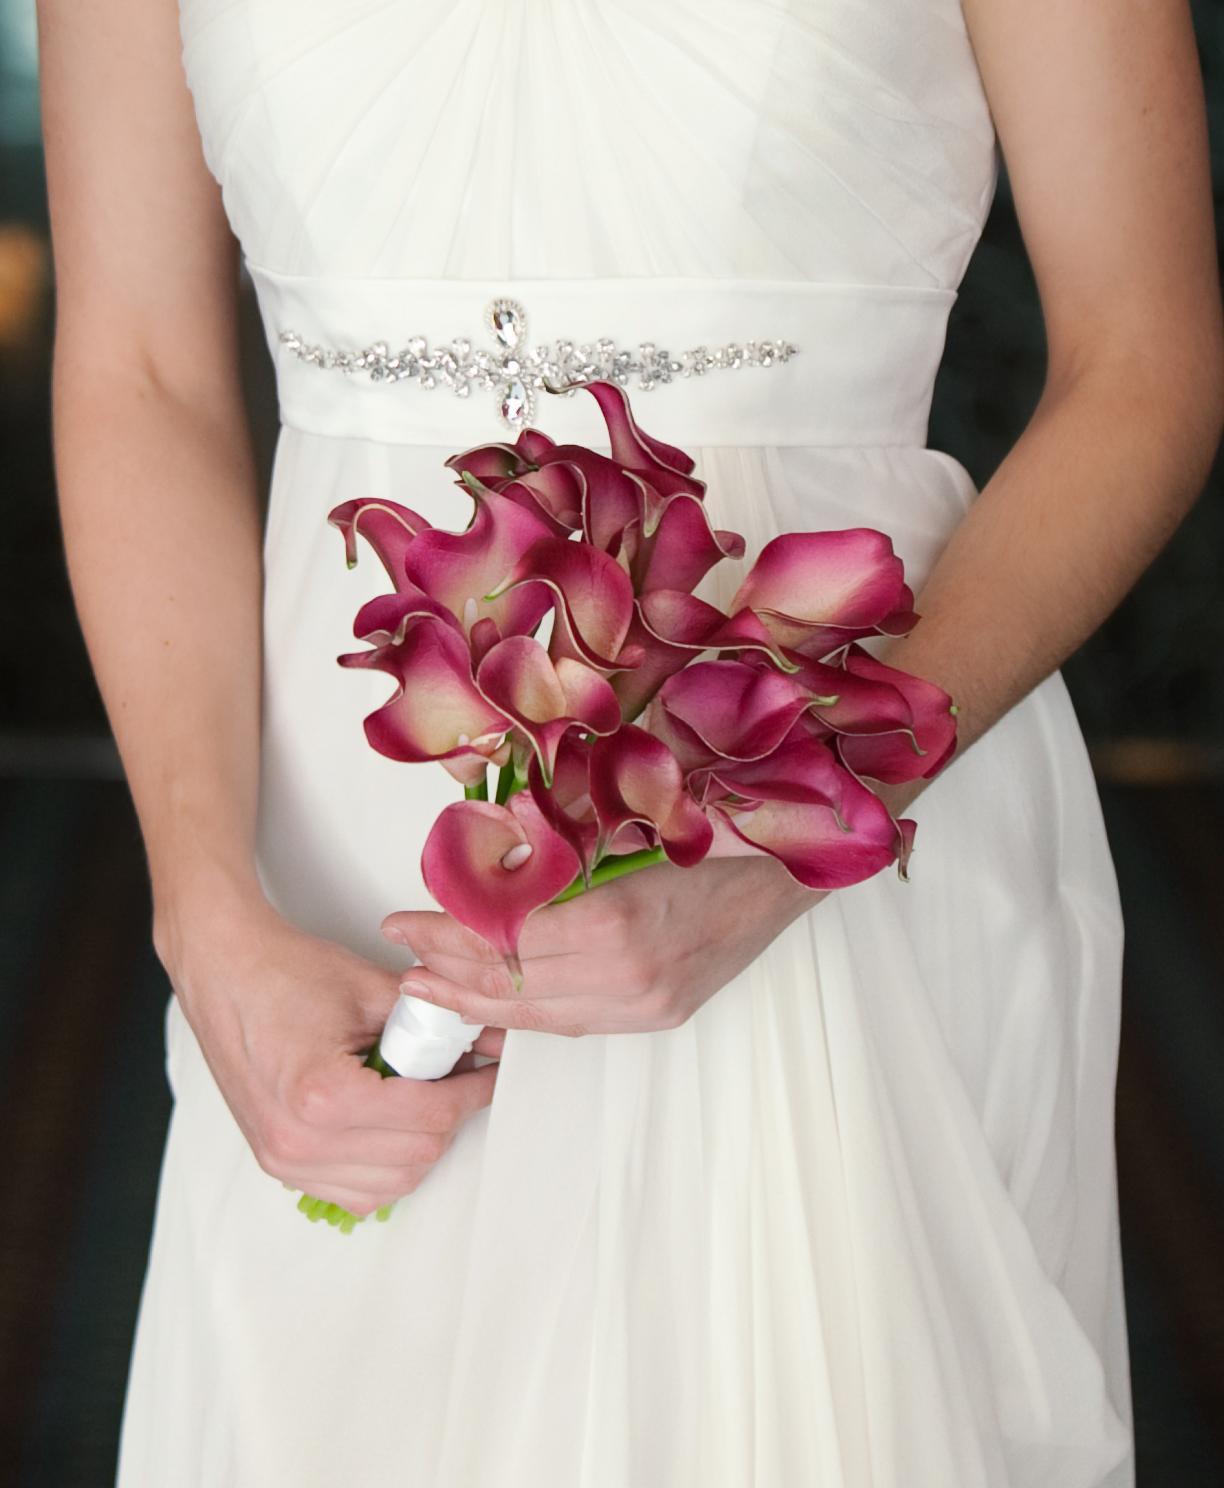 Lush Life Weddings